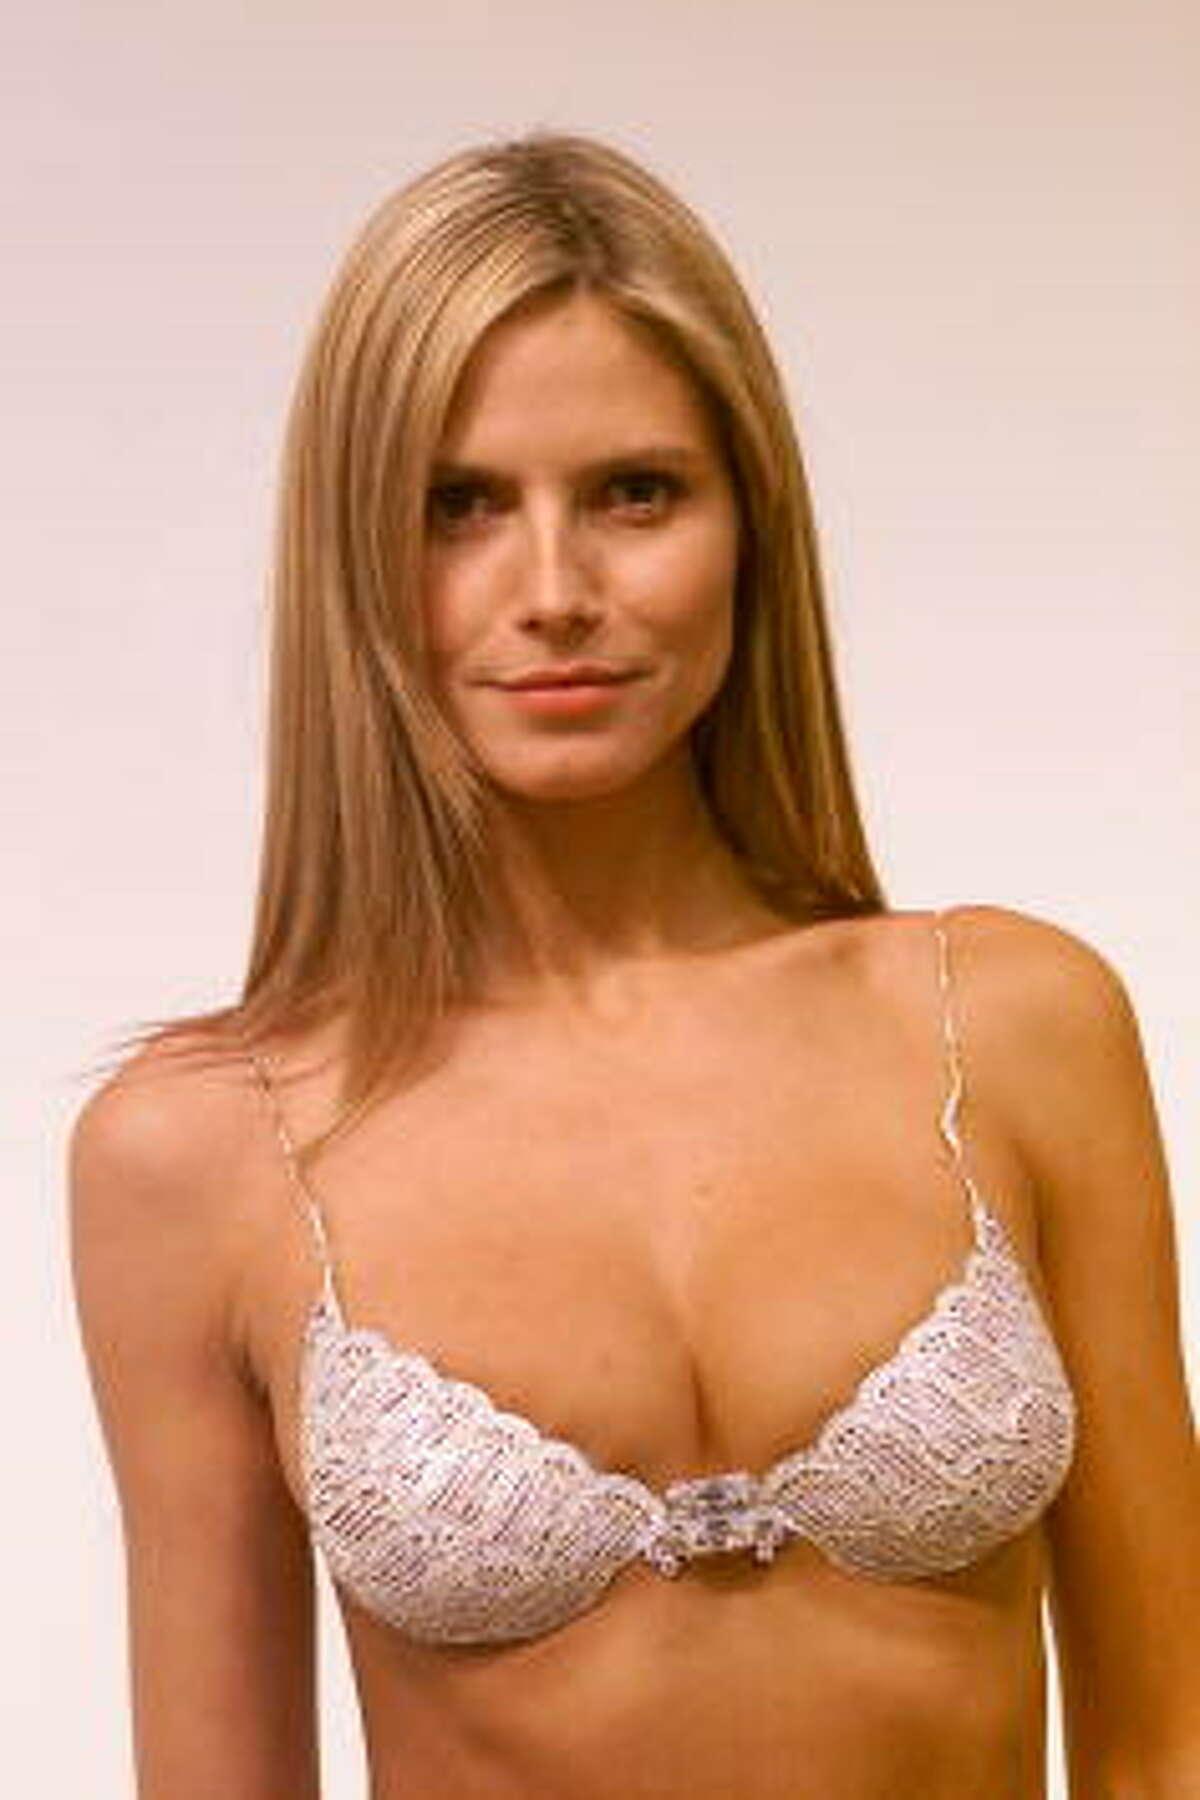 Valued: $12.5 million Victoria's Secret 2001 Fashion Show: Model Heidi Klum wearing the $12.5 million Fantasy Bra.